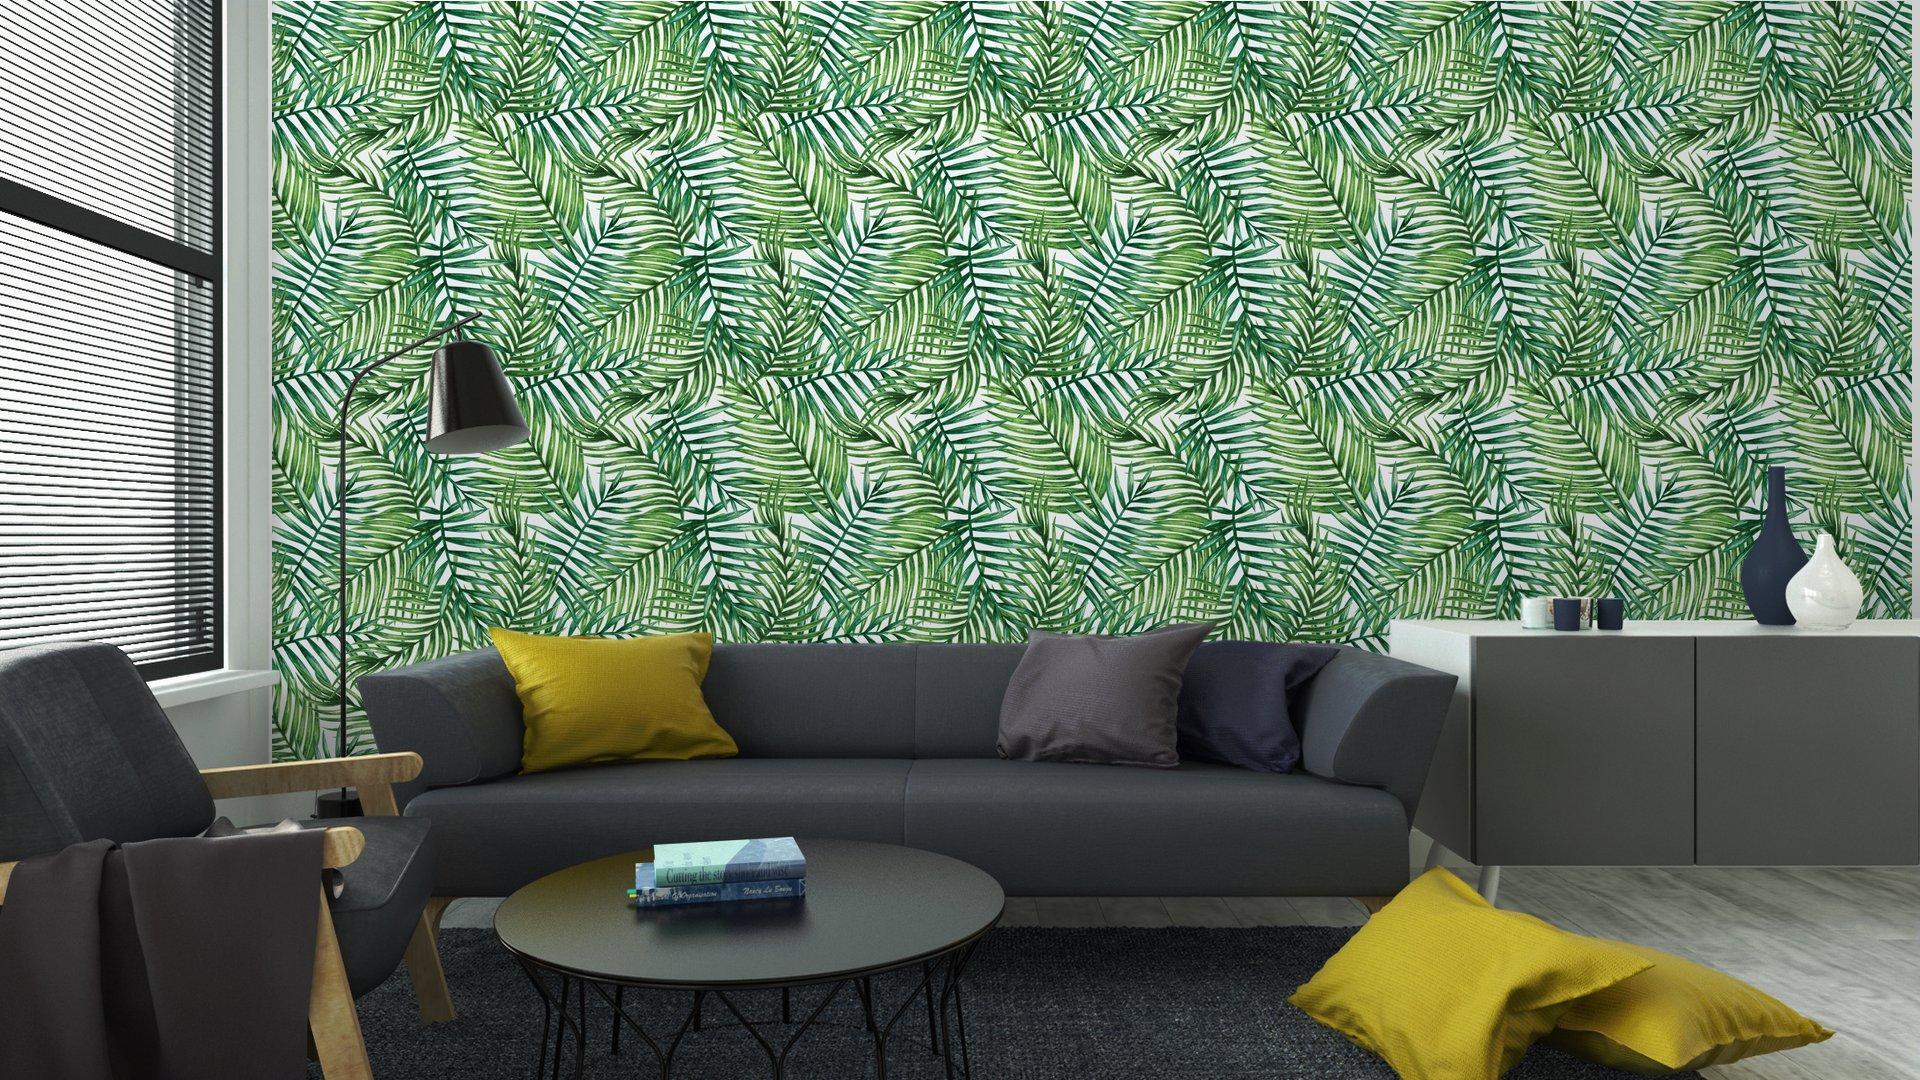 Fotomurales mexico papeles pintados autoadhesivos watercolor tropical palm leaves seamless pattern vector illustration 5 - Papel Tapiz Hojas Tropicales Tipo Acuarela en Fondo Blanco 04